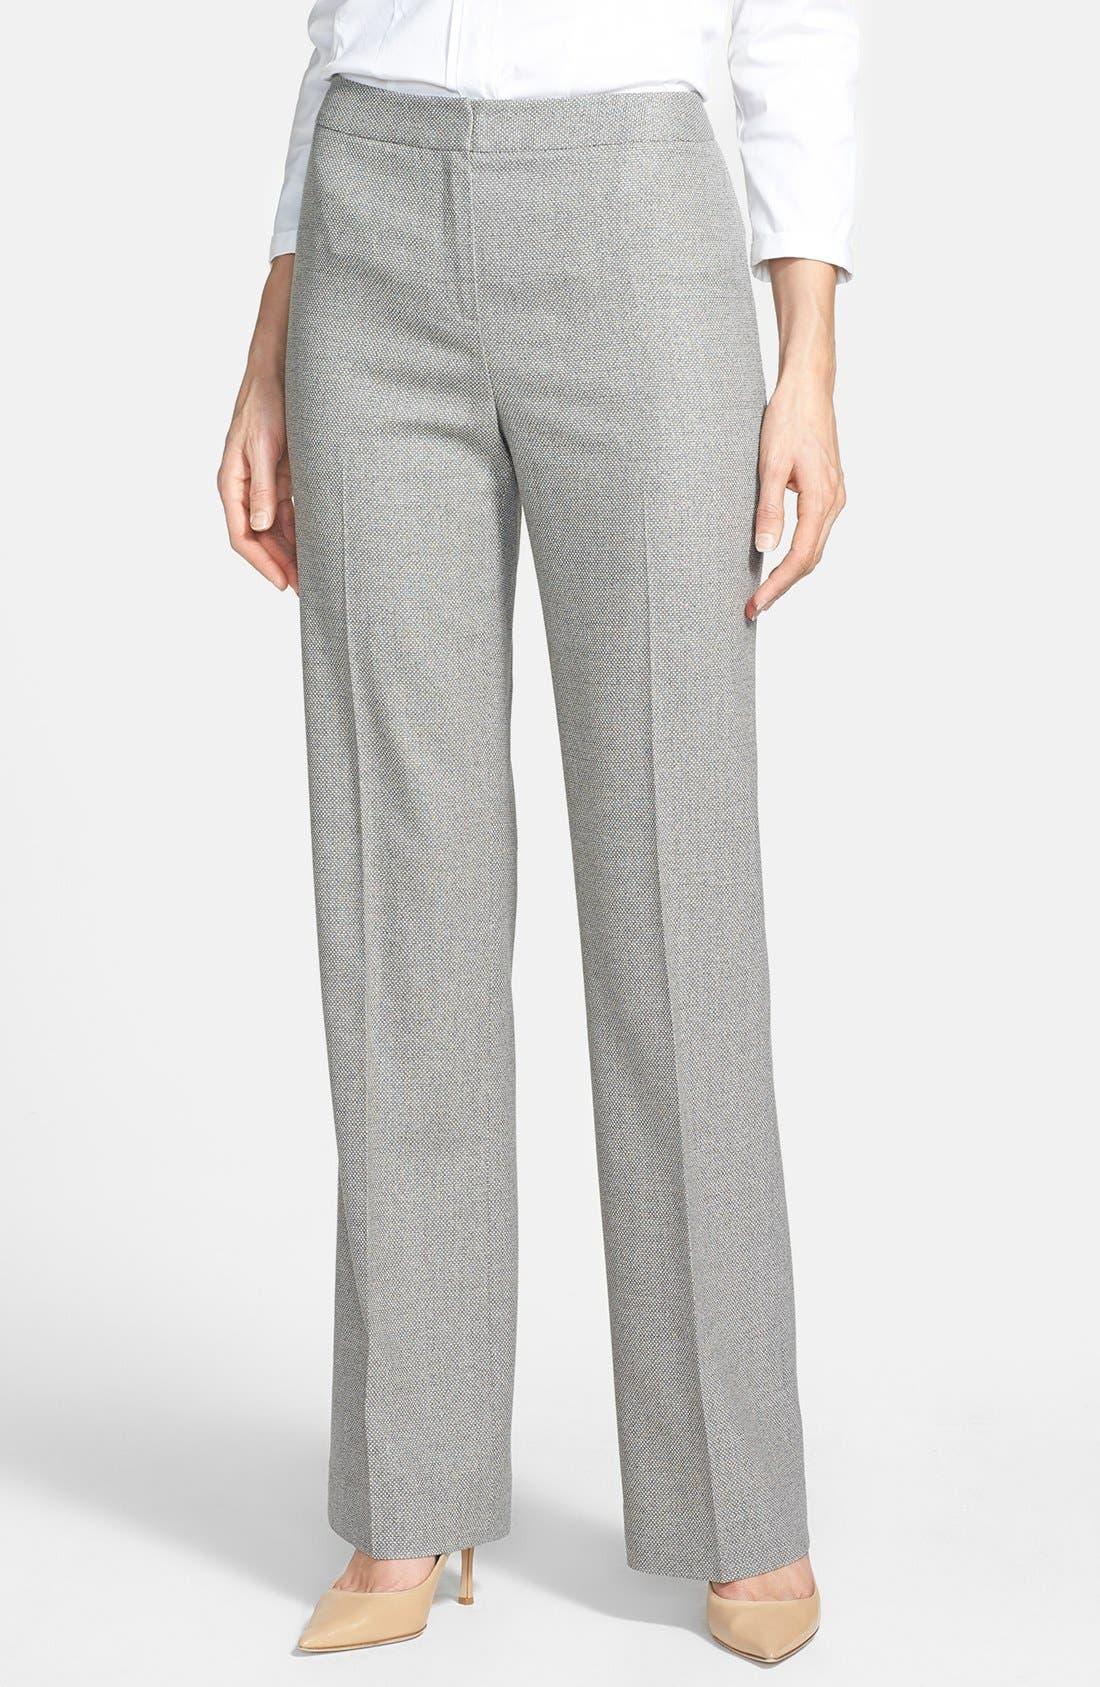 Alternate Image 1 Selected - Lafayette 148 New York Silk Blend Pants